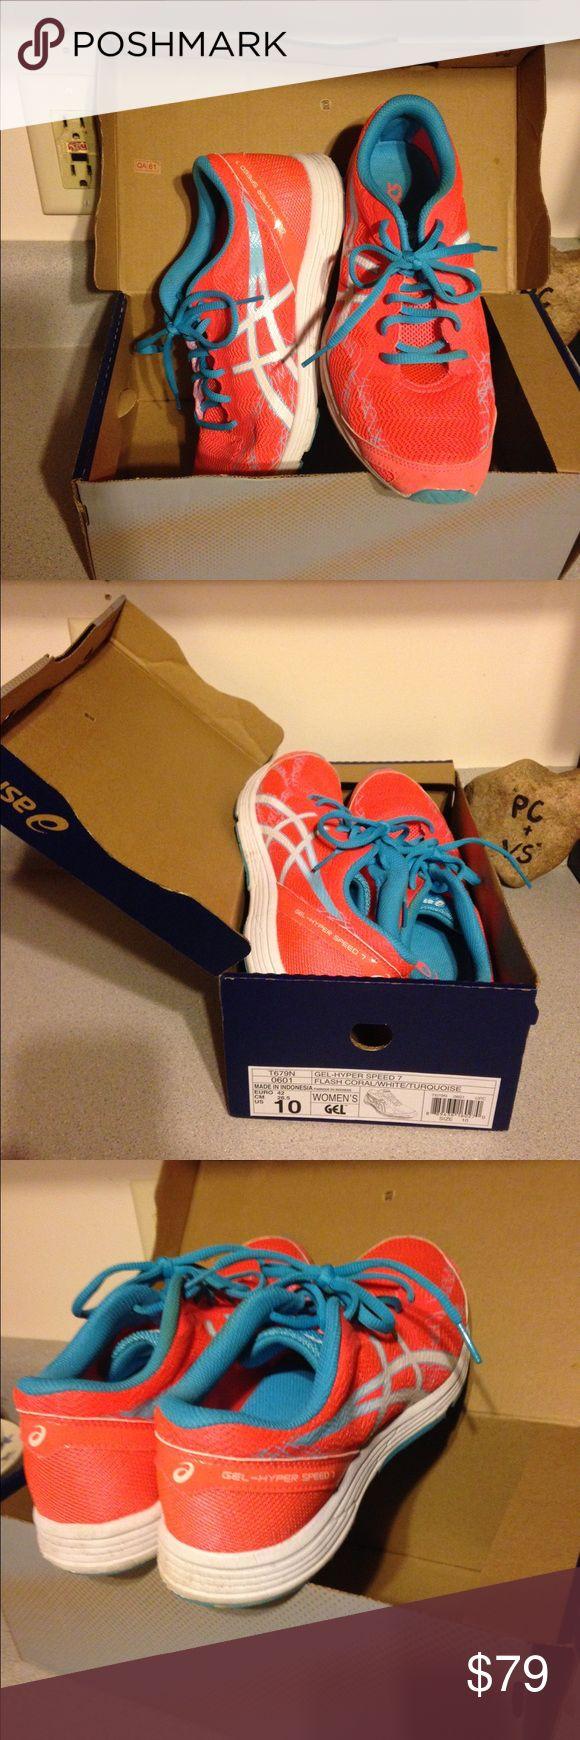 NEW Asics Hyper Speed Coral Running Sneakers NEW IN BOX Asics Gel Hyper Speed 7 Flash